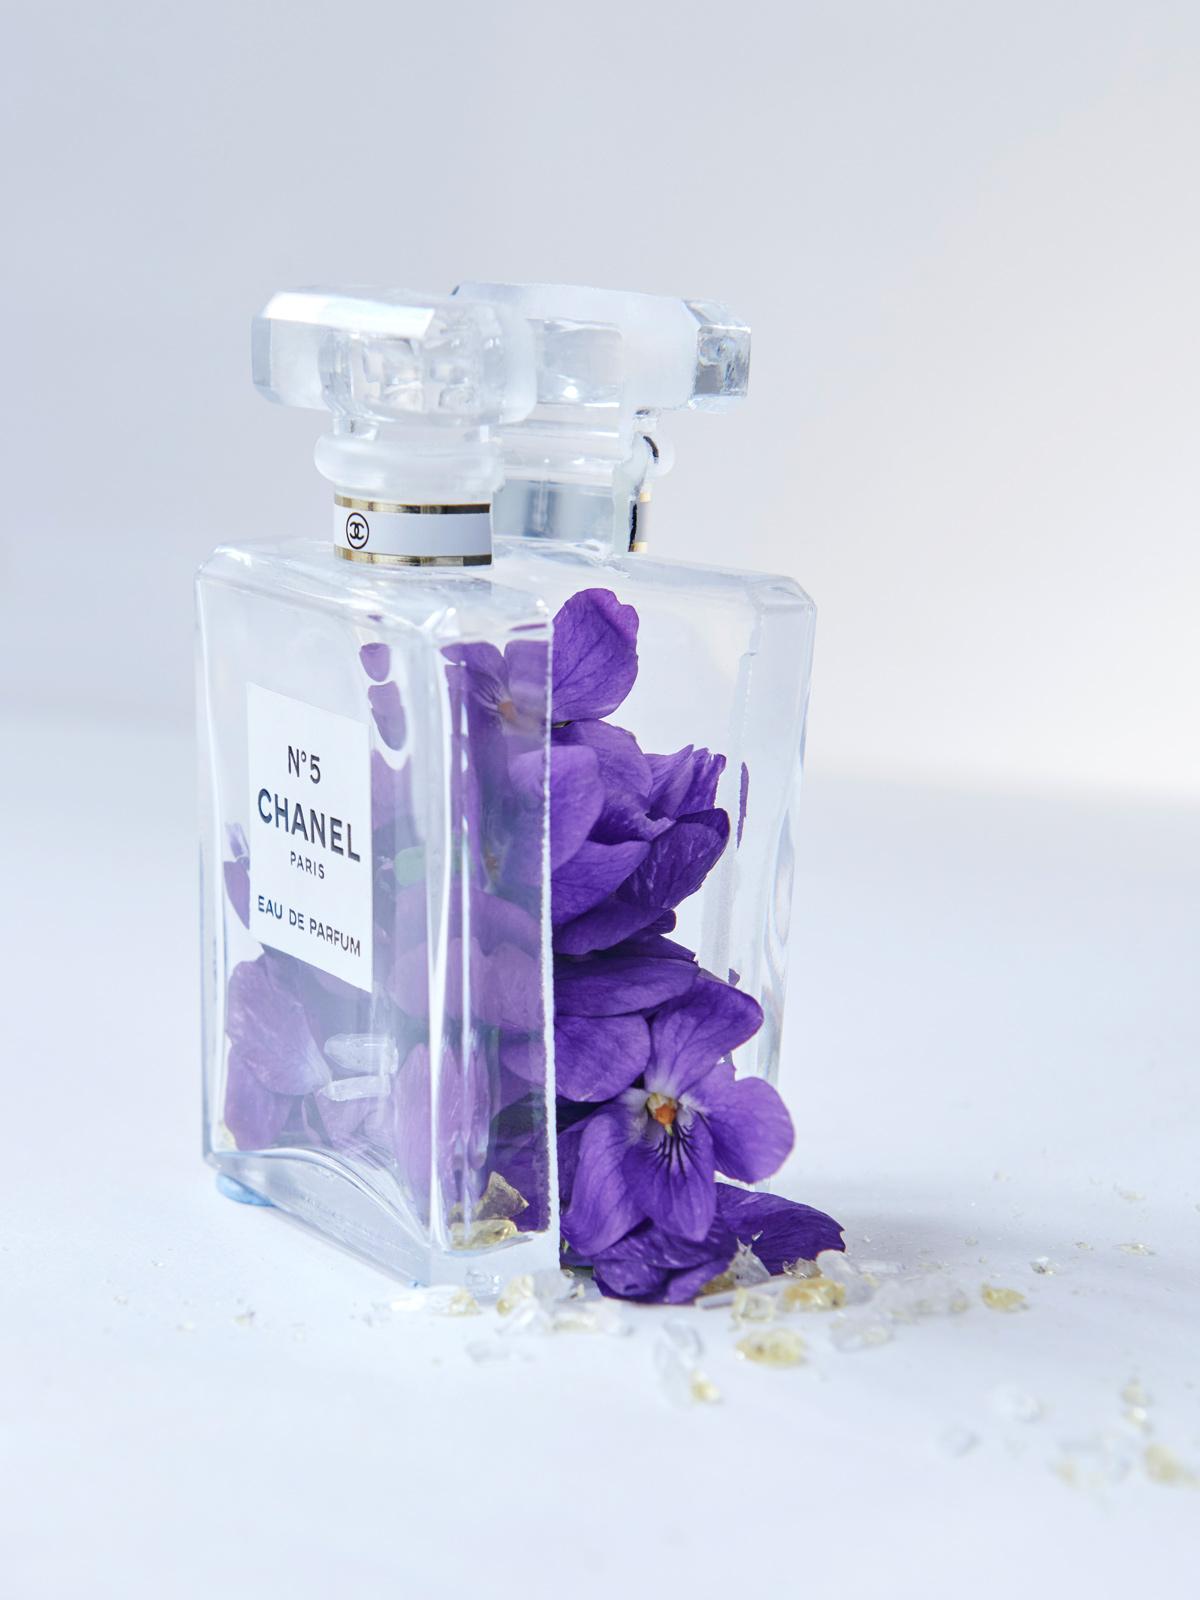 Chanel no 5 perfume still life